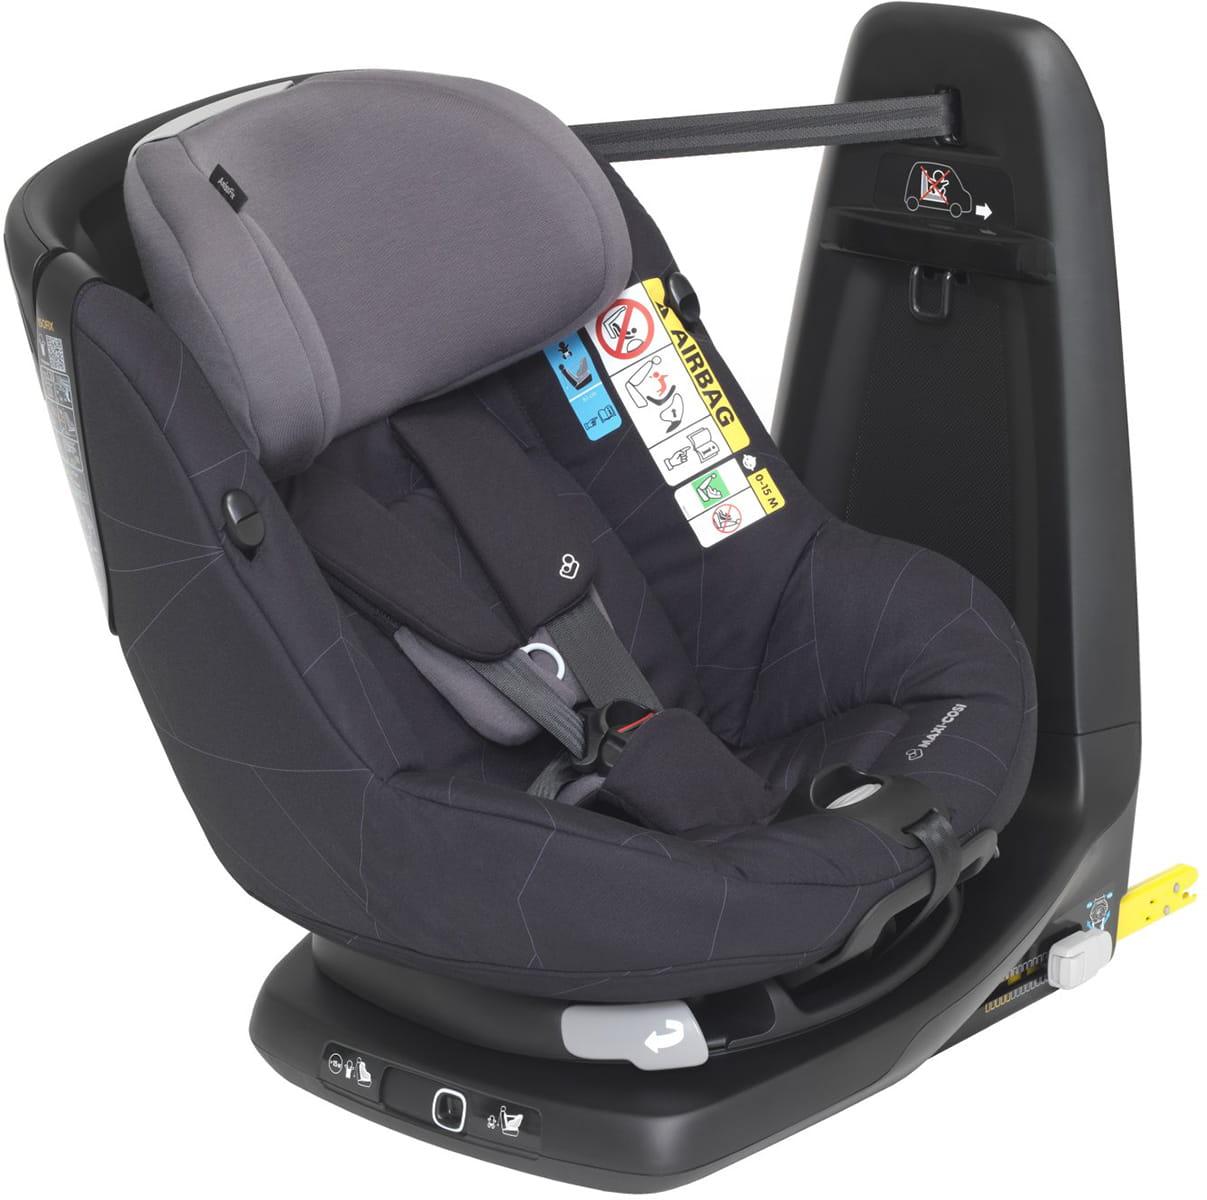 c16afa13275d7e Maxi Cosi AxissFix - obrotowy fotelik samochodowy | Black Diamond ...